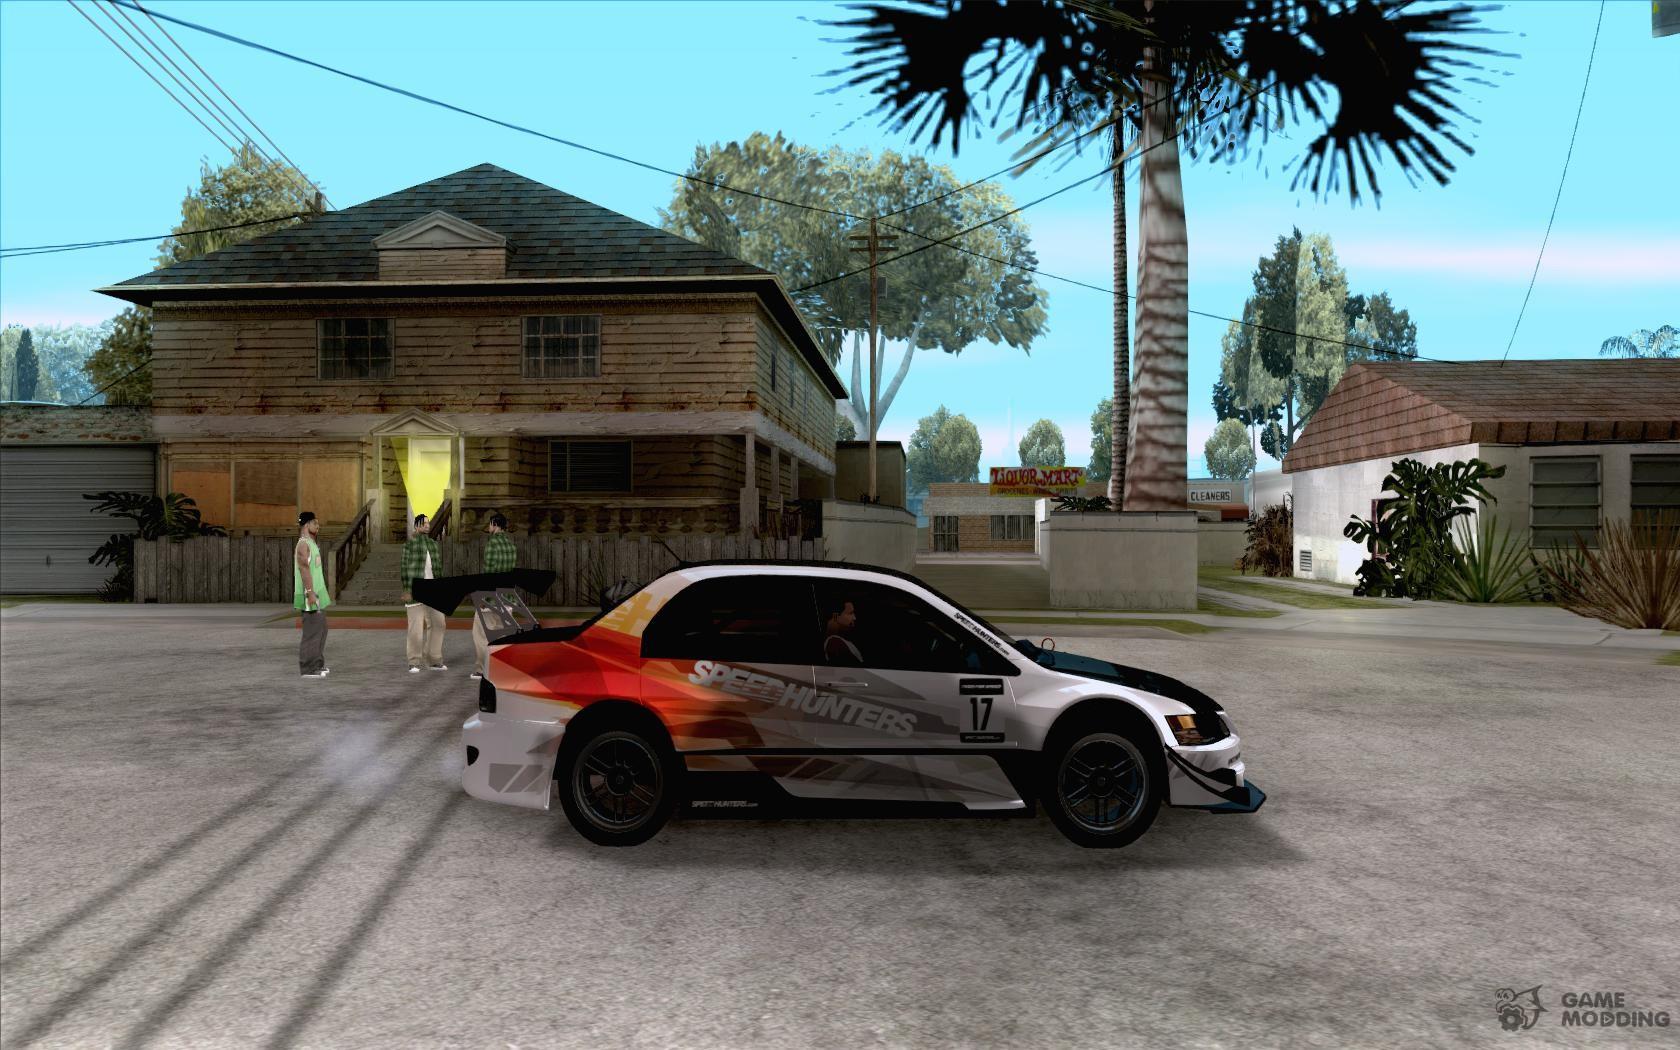 Mitsubishi lancer evo ix speedhunters edition for gta san andreas inside view